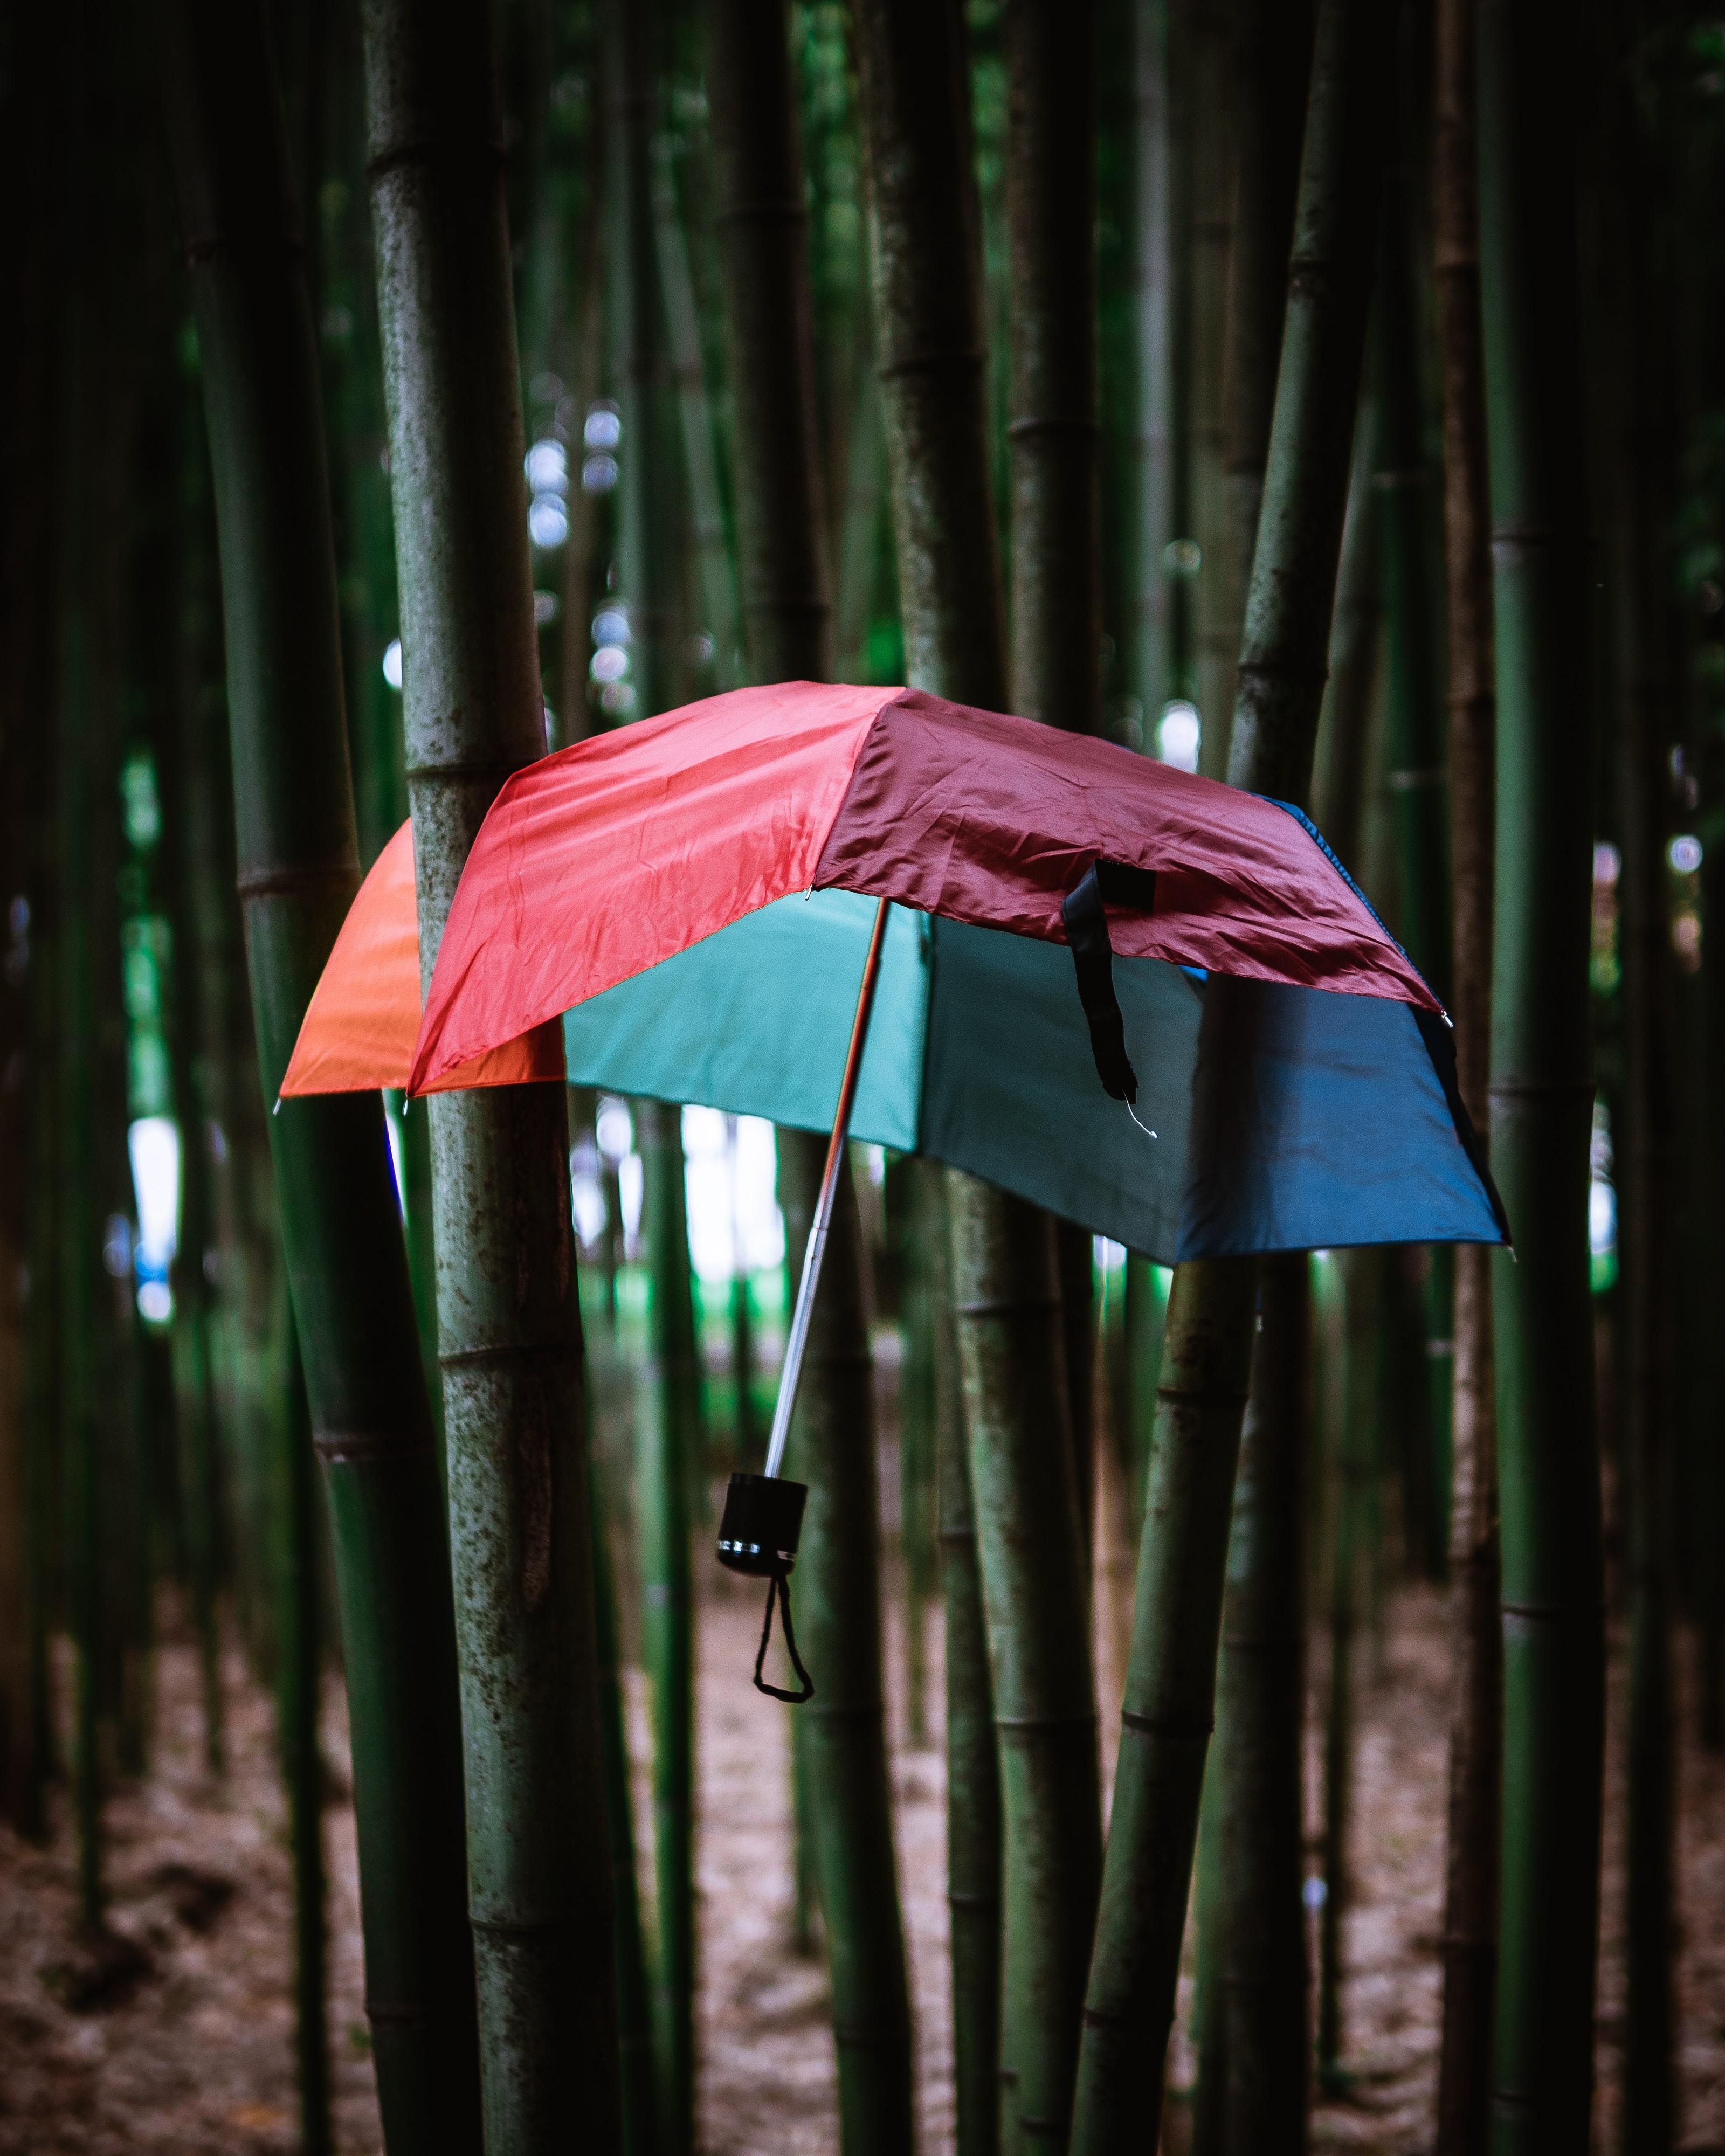 umbrella stocked on bamboo plants